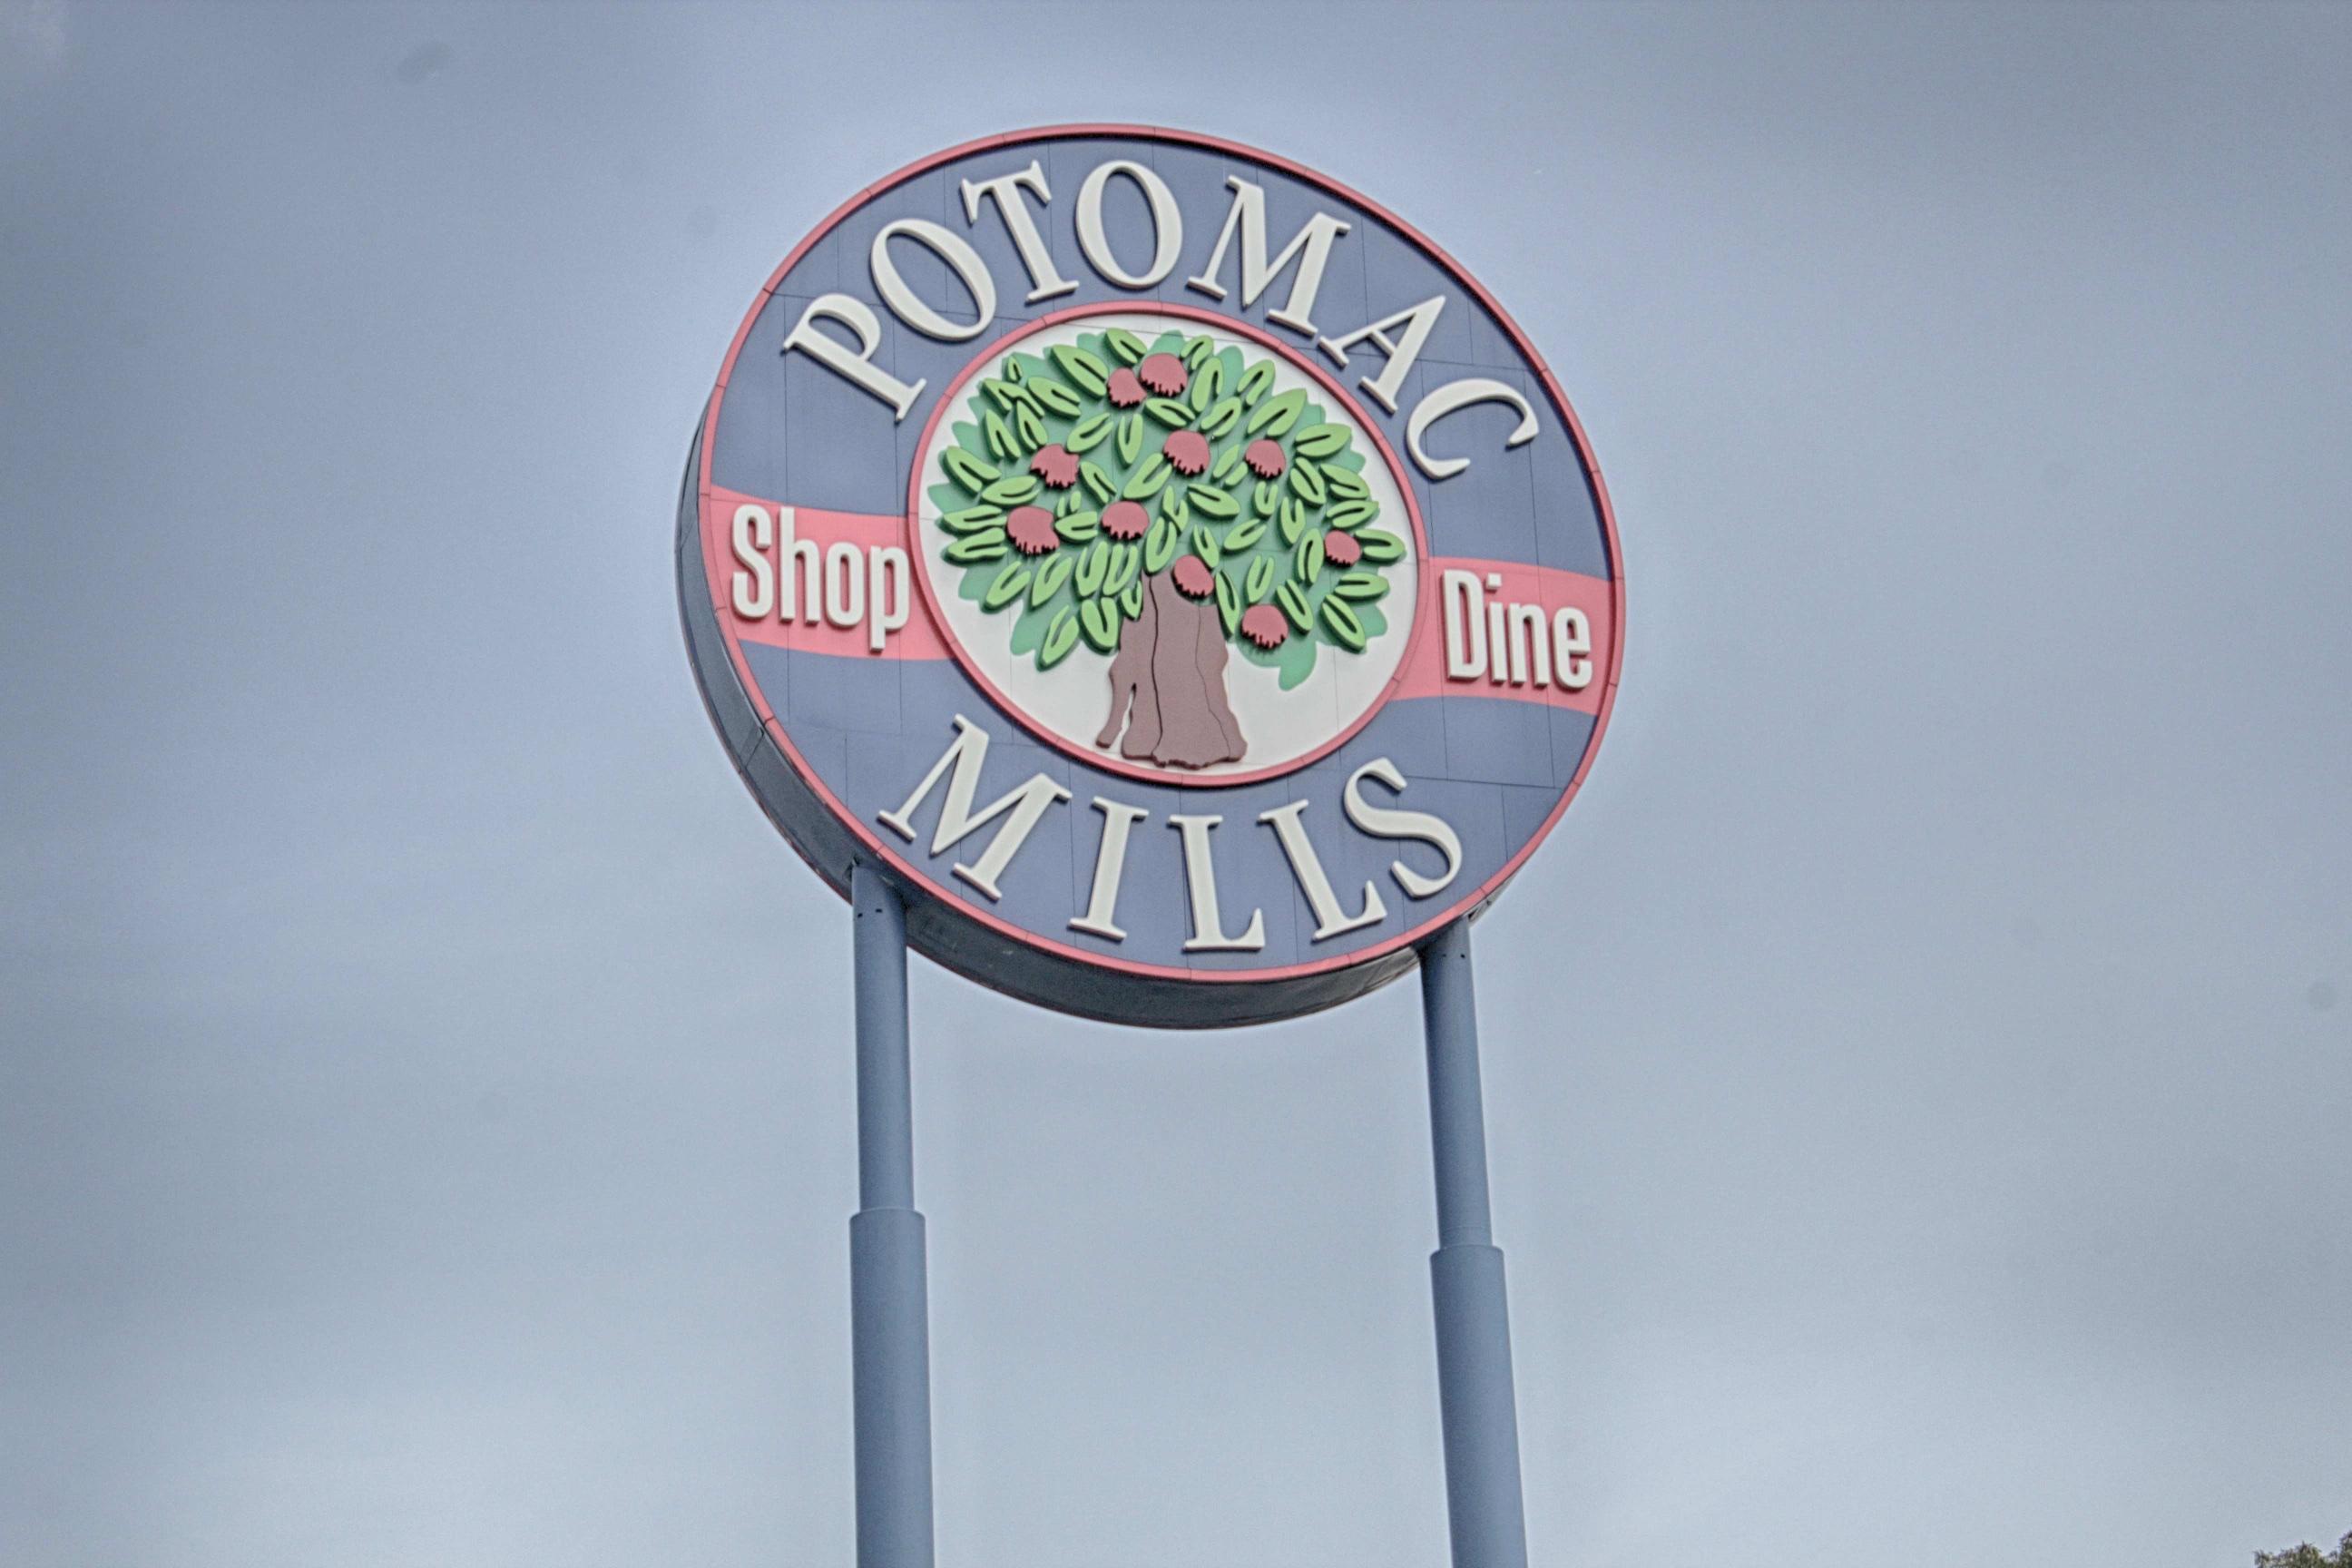 comm-potomac-mills-sign